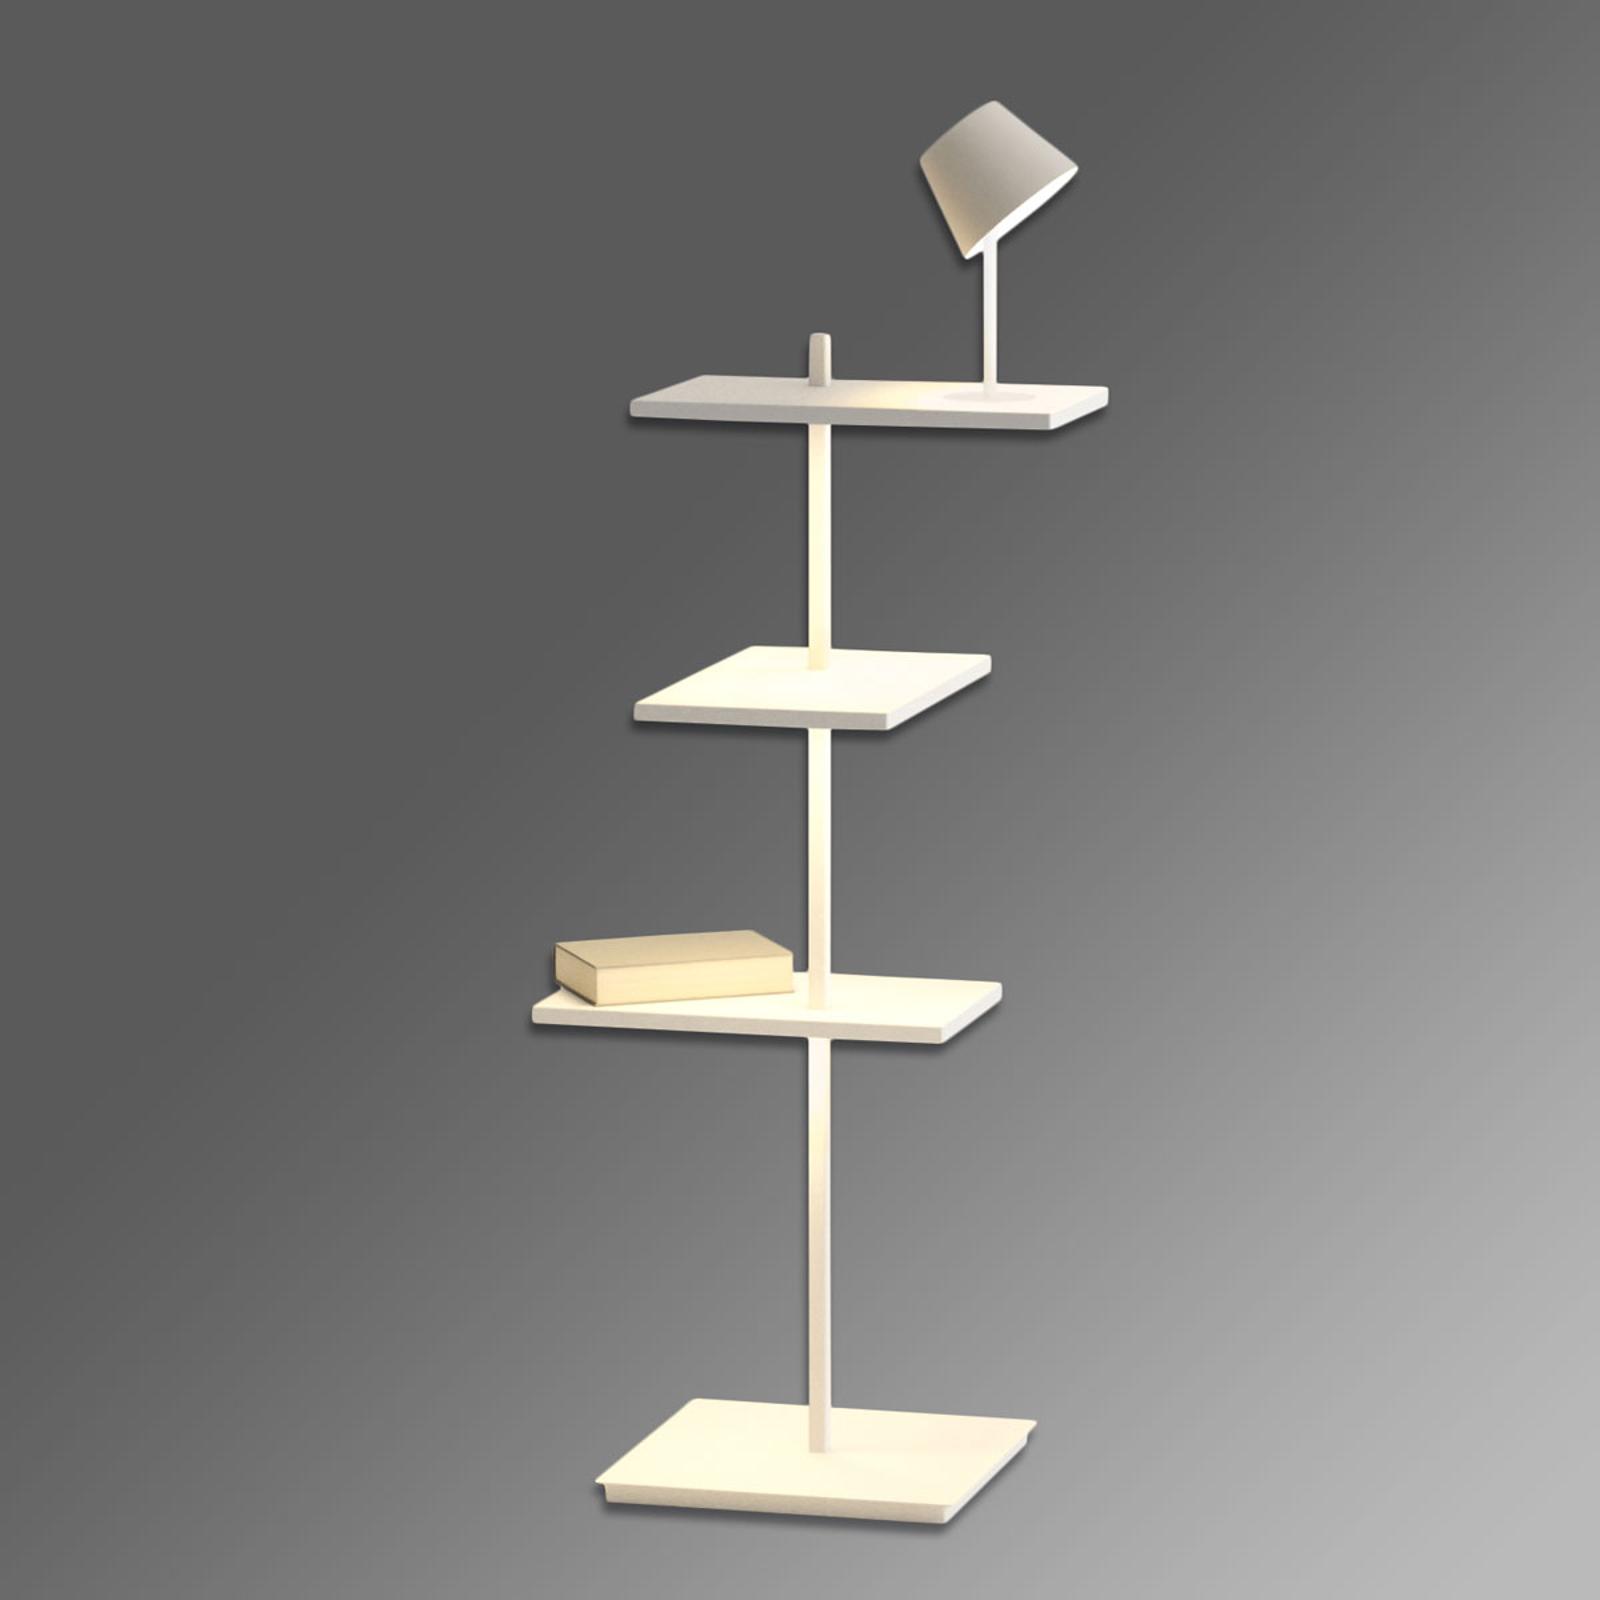 Multifunctionele led vloerlamp Suite 112 cm